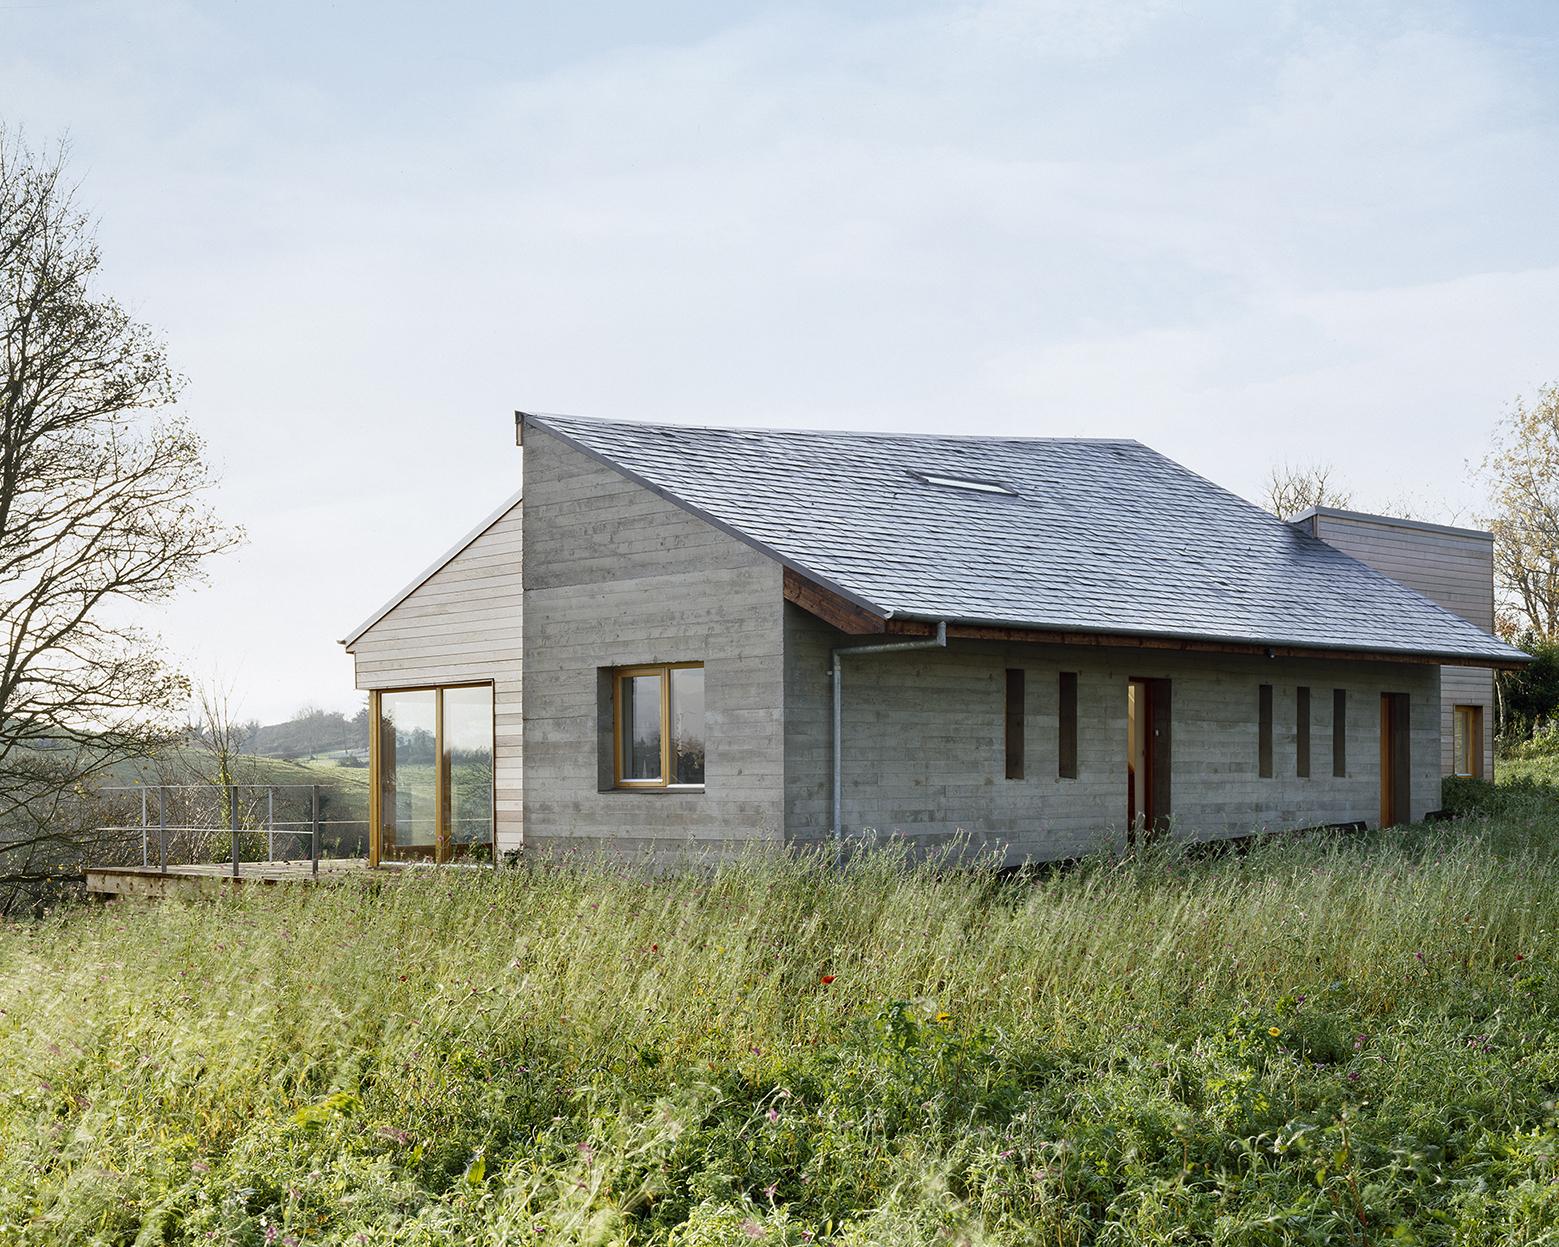 Casa Carton Levert de Macgabhann Architects-levert-macgabhann-architects_0803tmgcl06